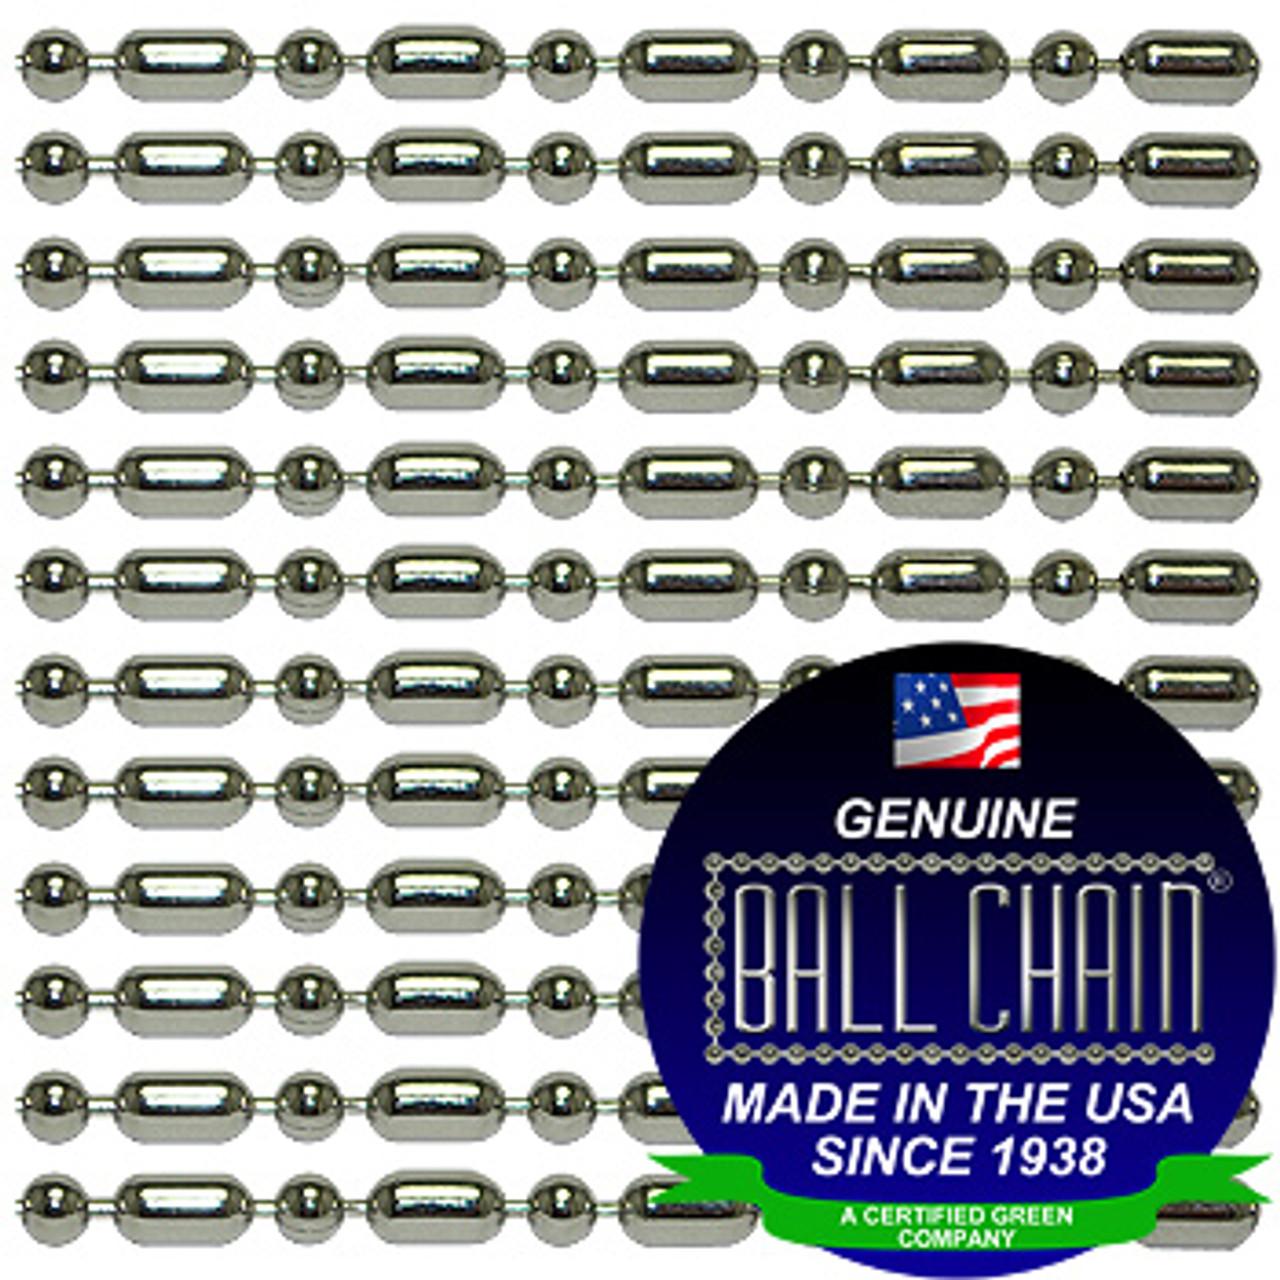 #3 Ball-Bar-Style Nickel Plated Steel Ball Chain Spool